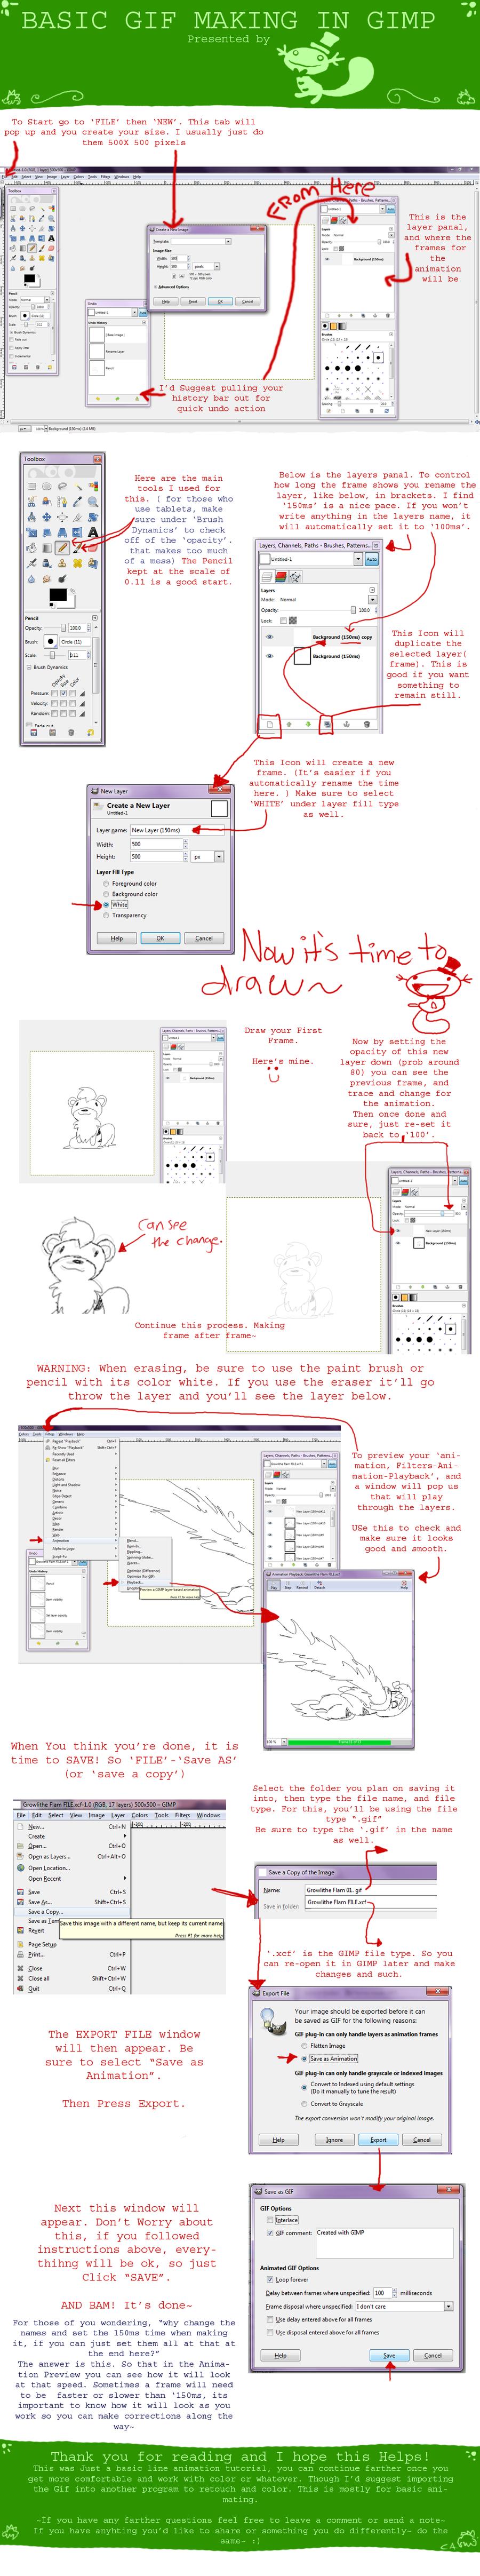 Basic GIMP Animated GIFs tutorial by CrazyIguana